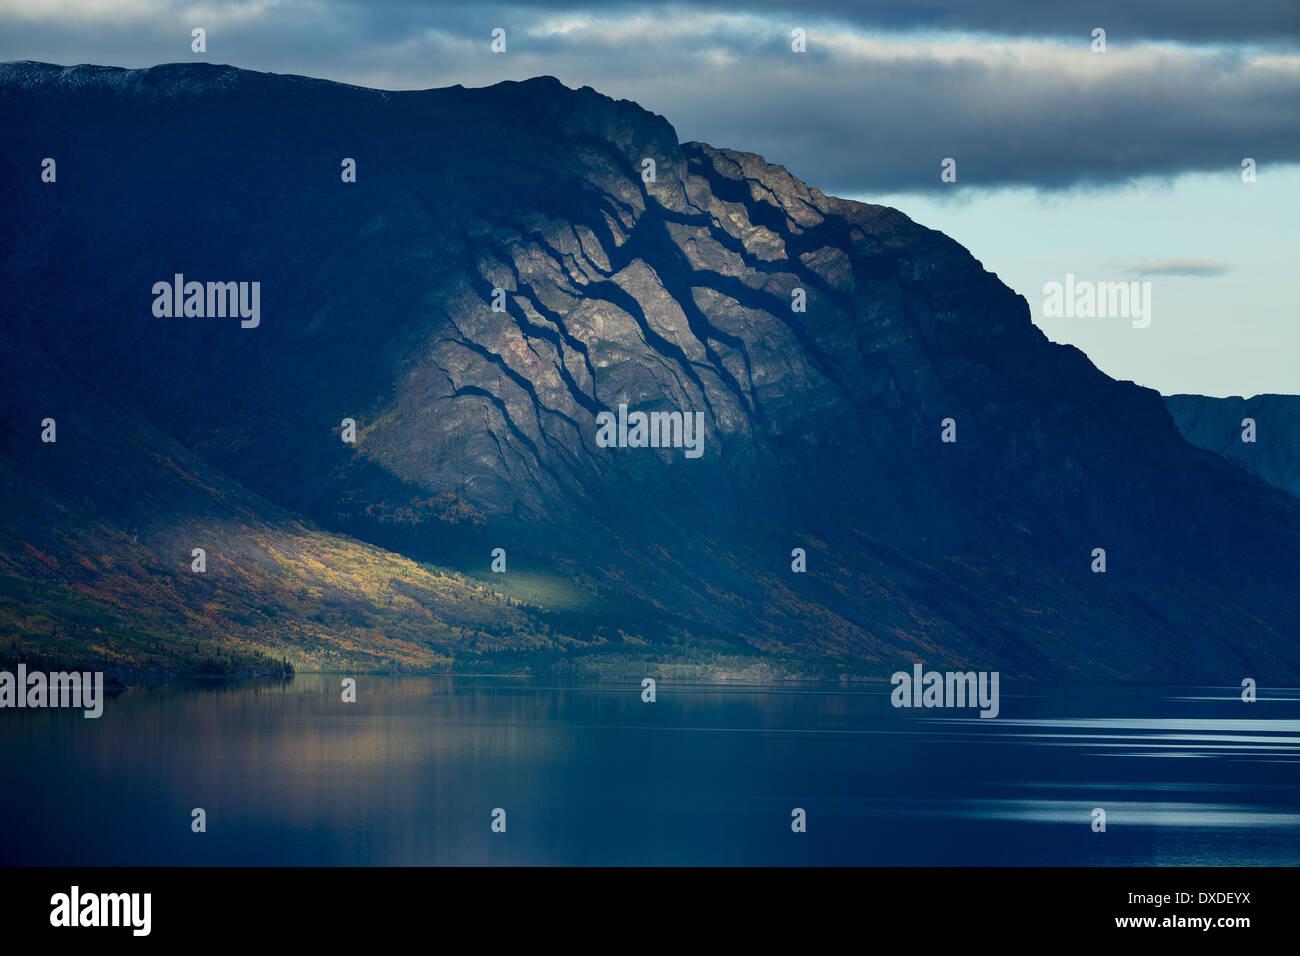 Lake Tagish, Carcross, British Columbia, Canada - Stock Image